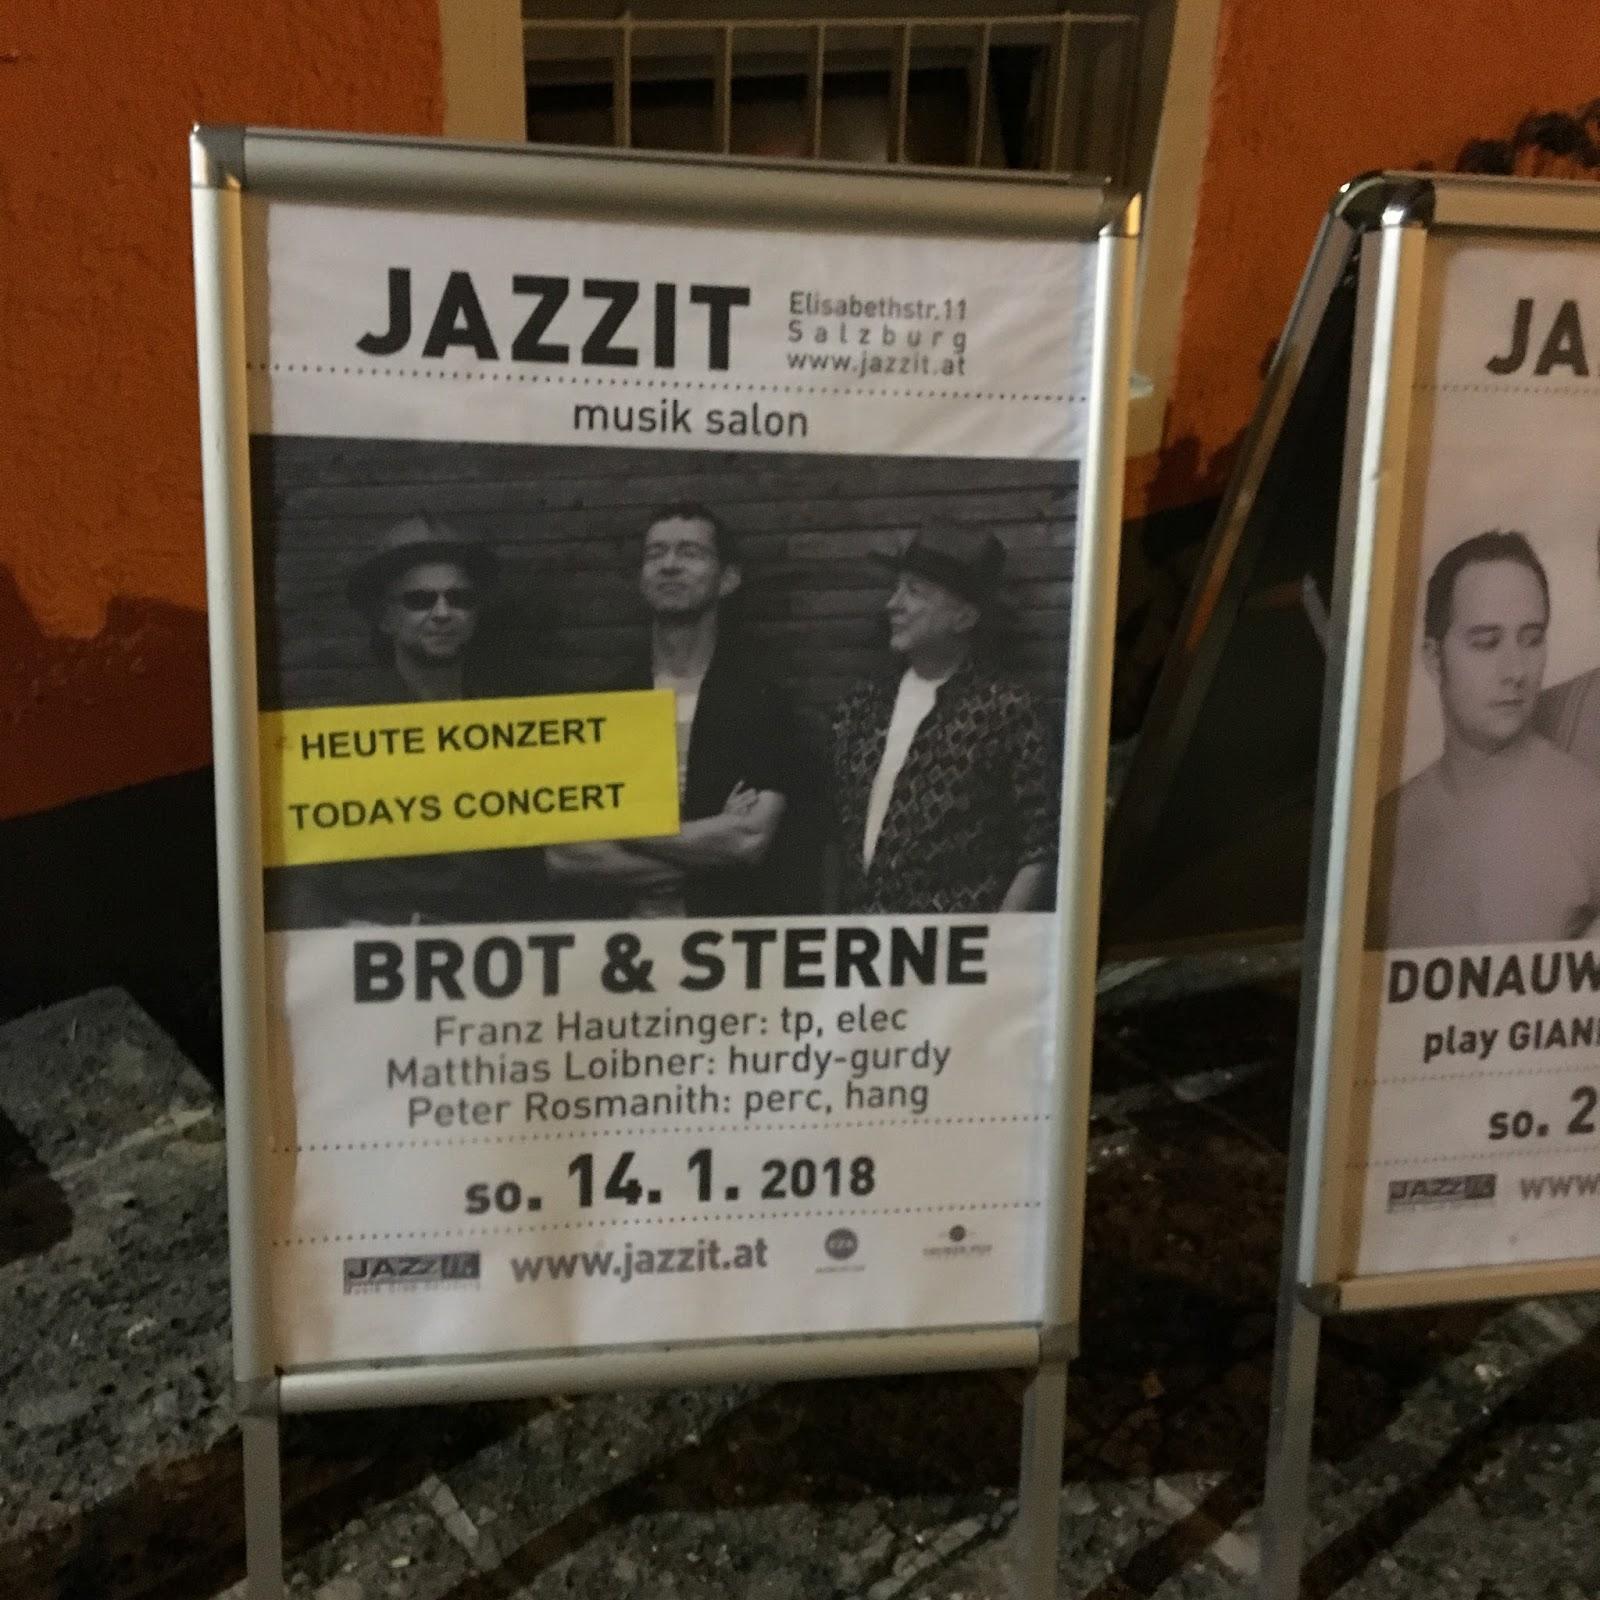 REVIEW/FEATURE: Brot & Sterne (Franz Hautzinger, Matthias